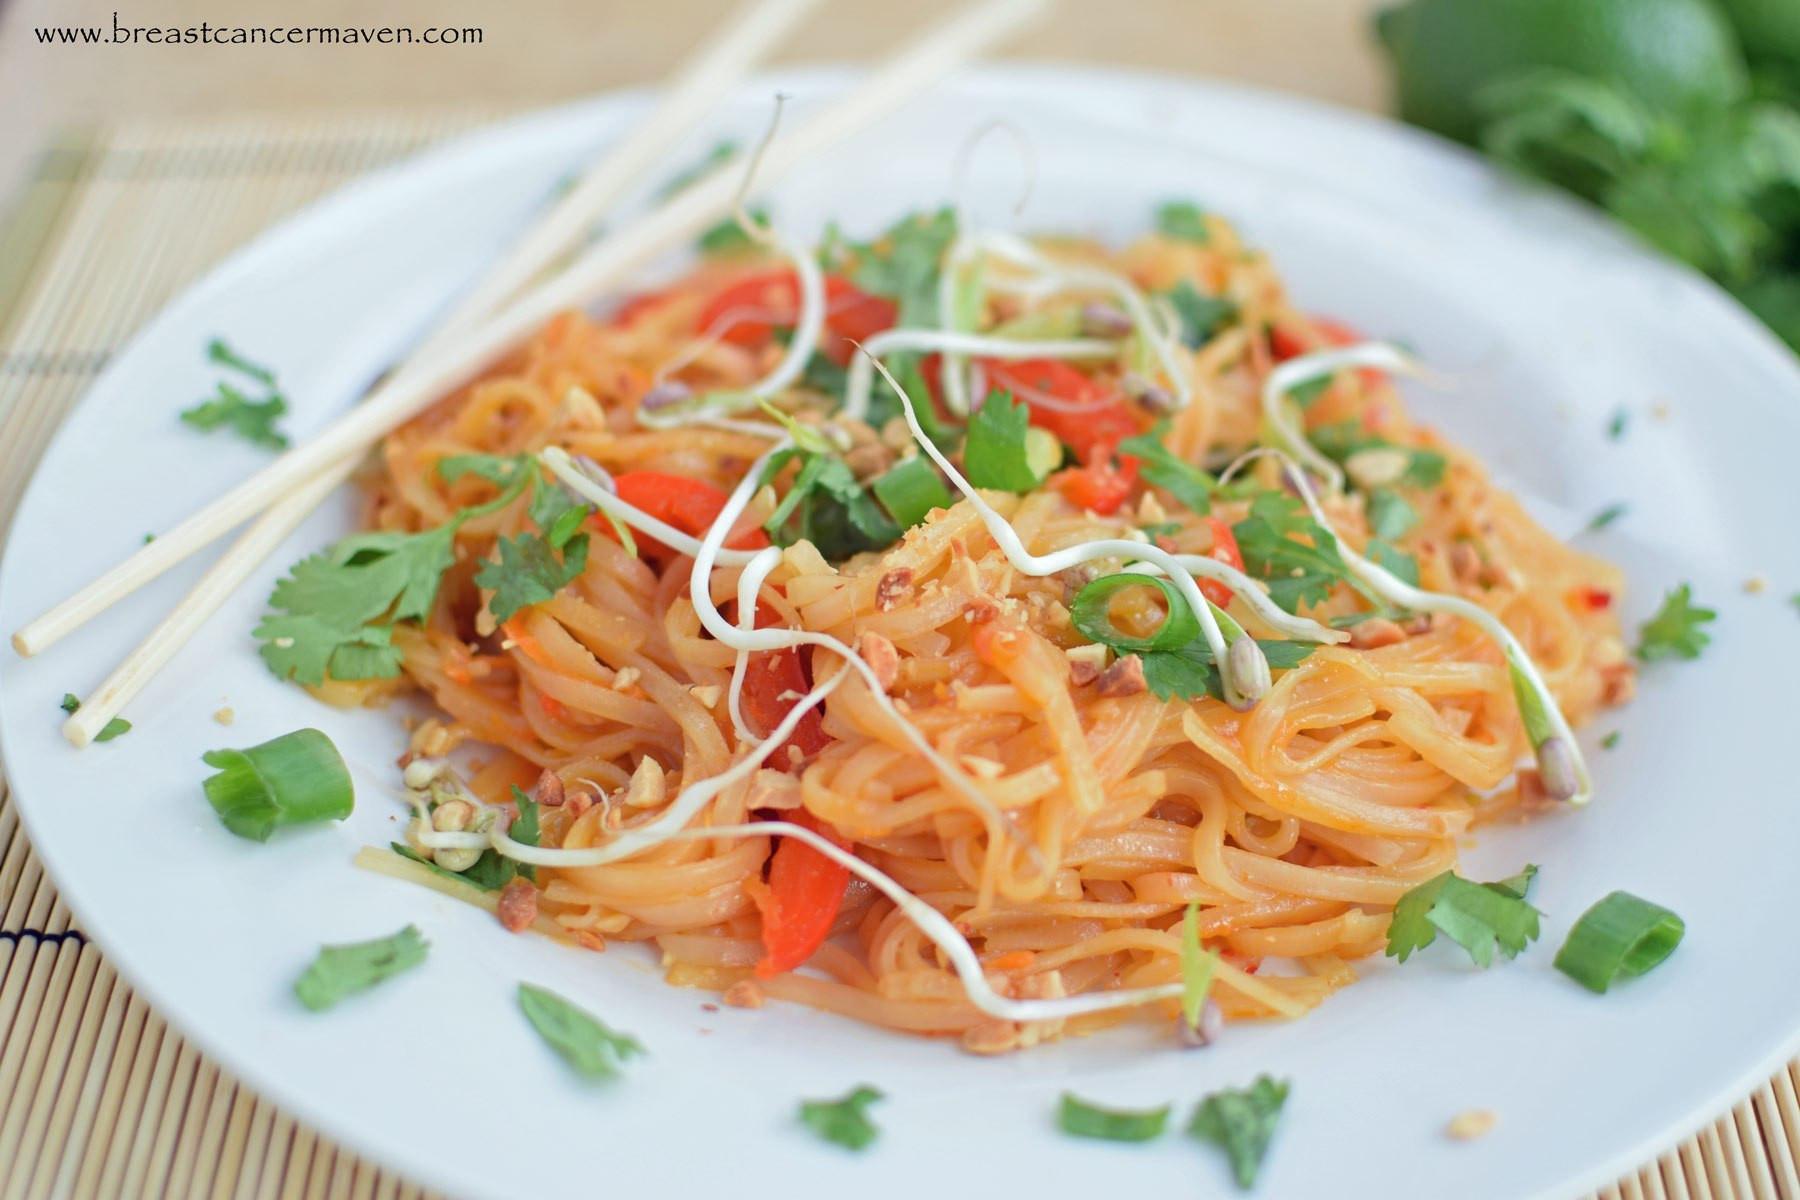 Pad Thai Healthy  Healthy Pad Thai Vegan and Gluten Free Breast Cancer Maven